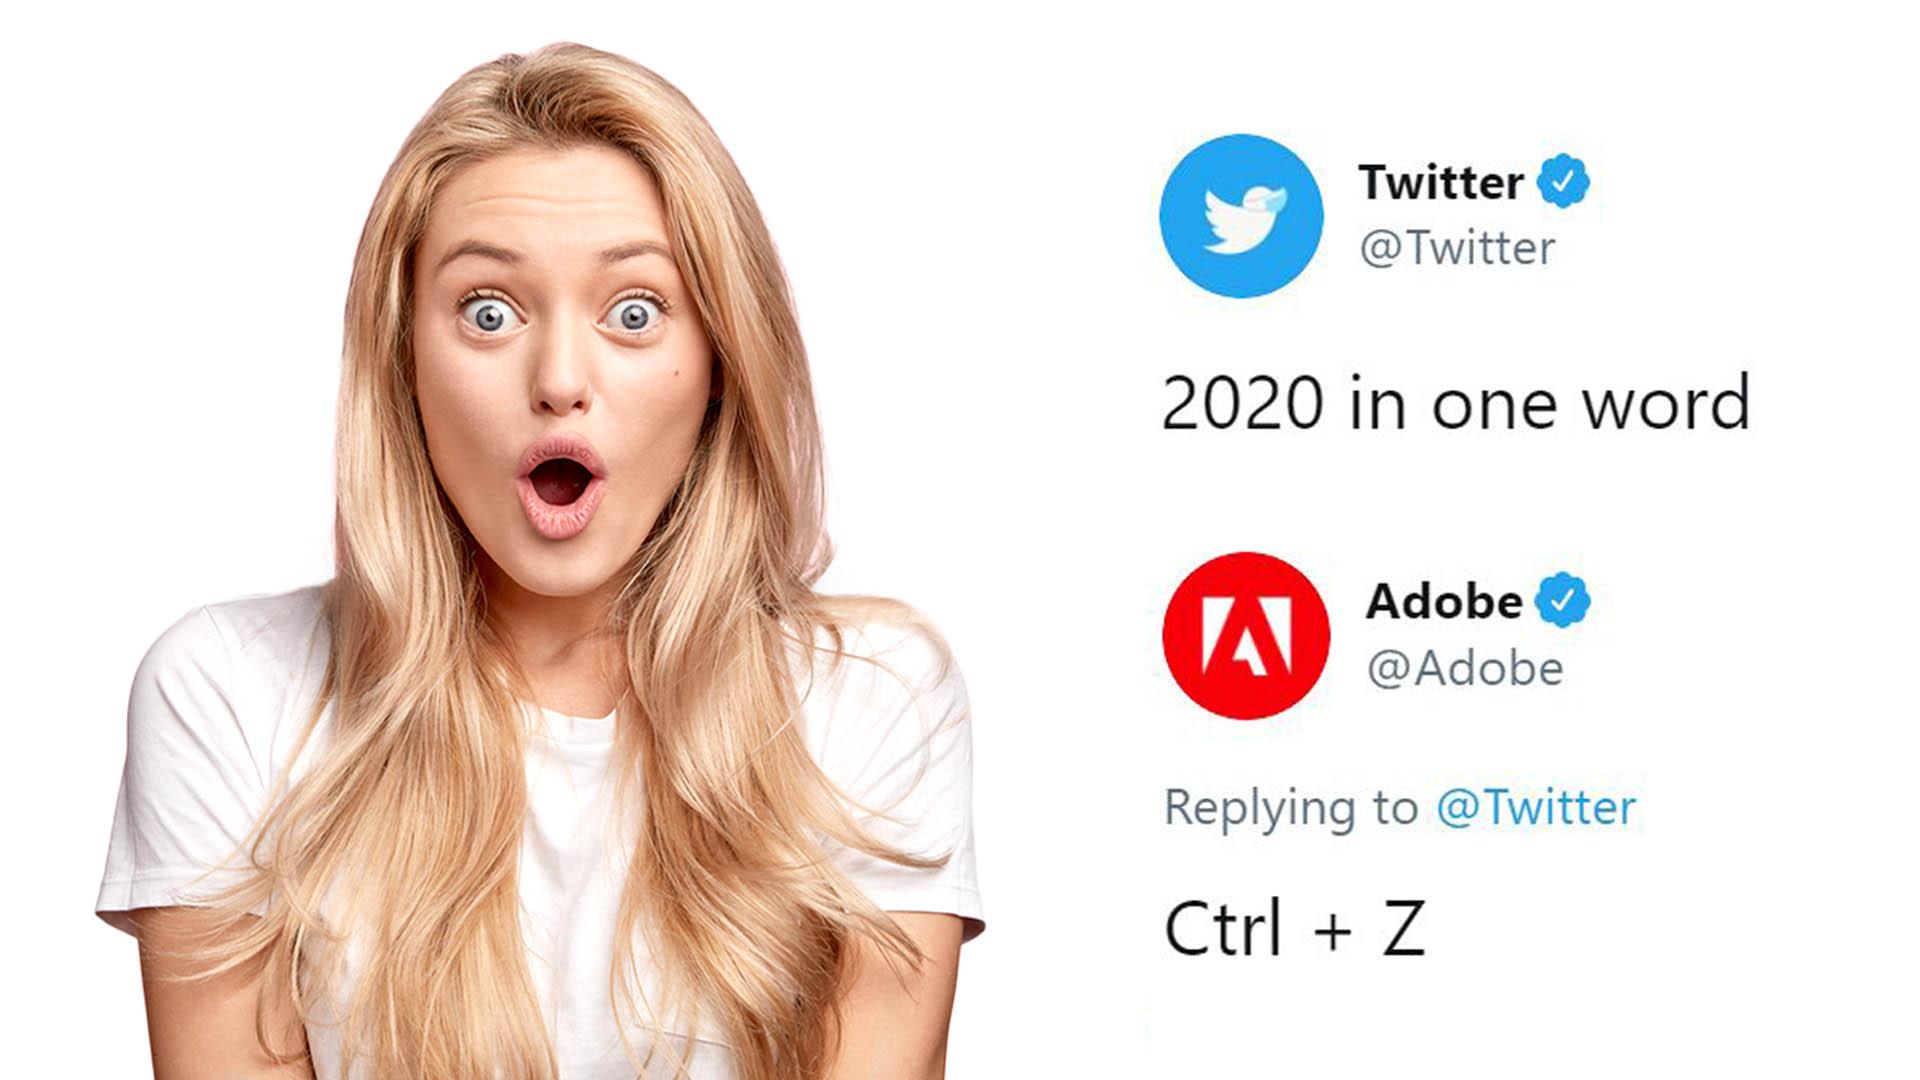 Adobe Photoshop reply twitter